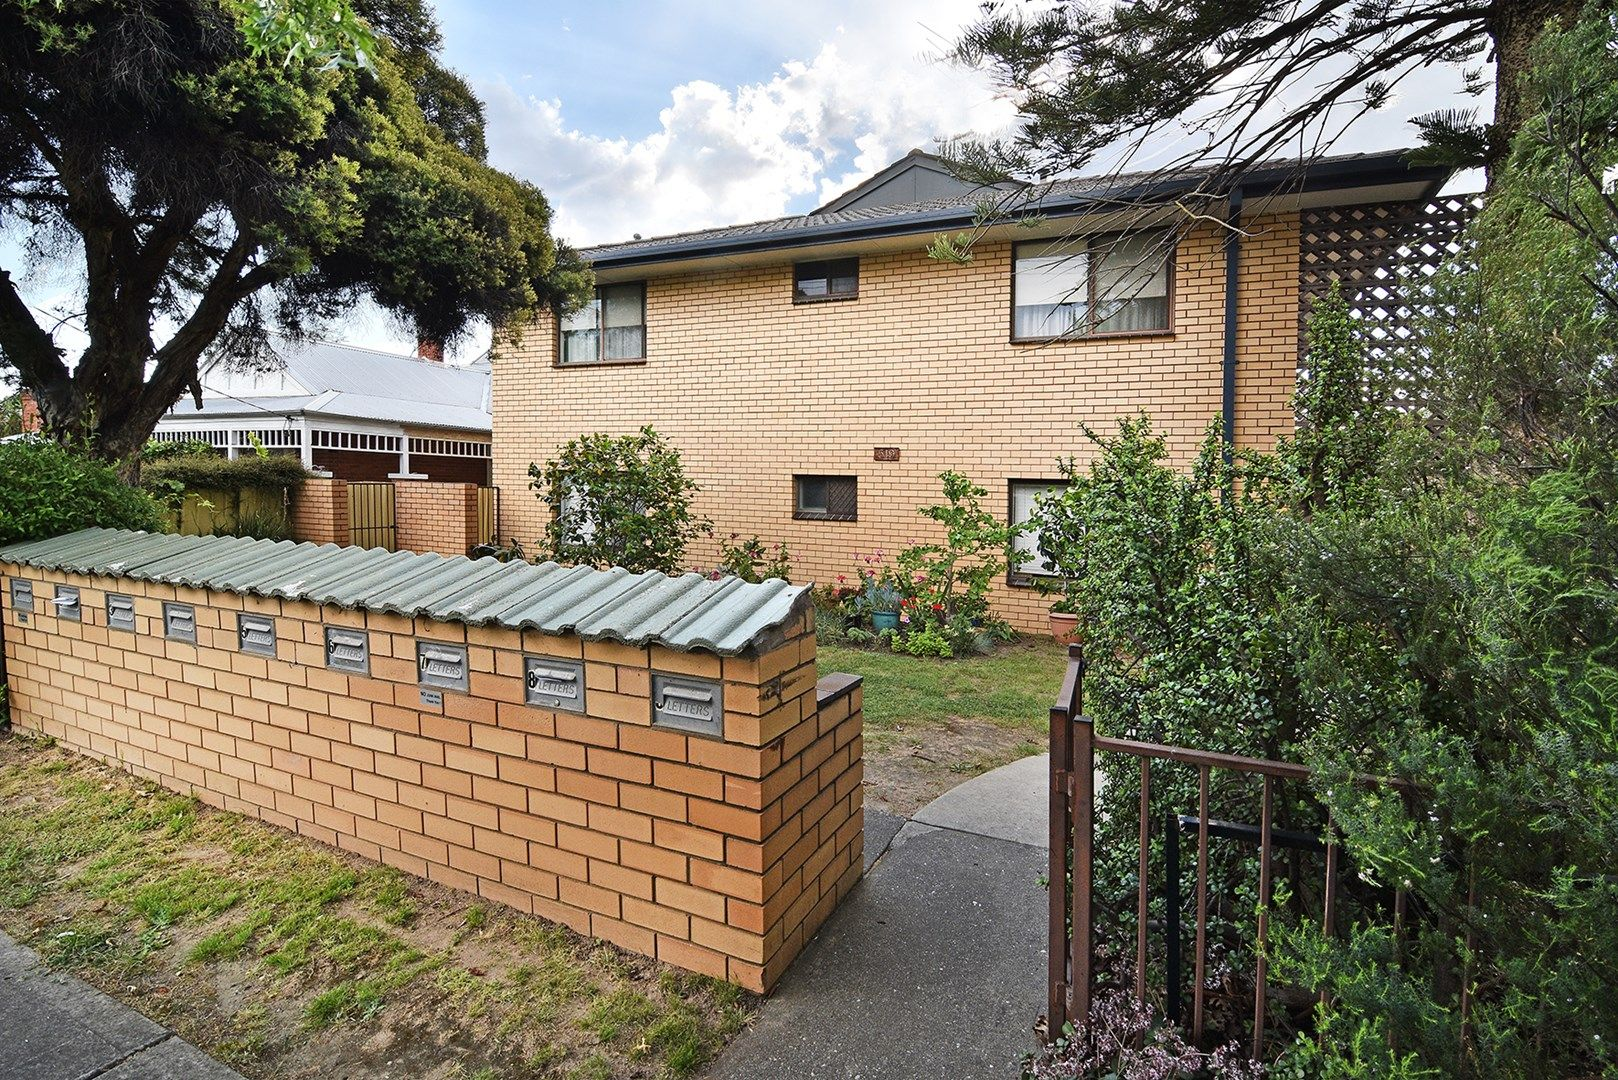 5/519 Schubach Street, Albury NSW 2640, Image 0